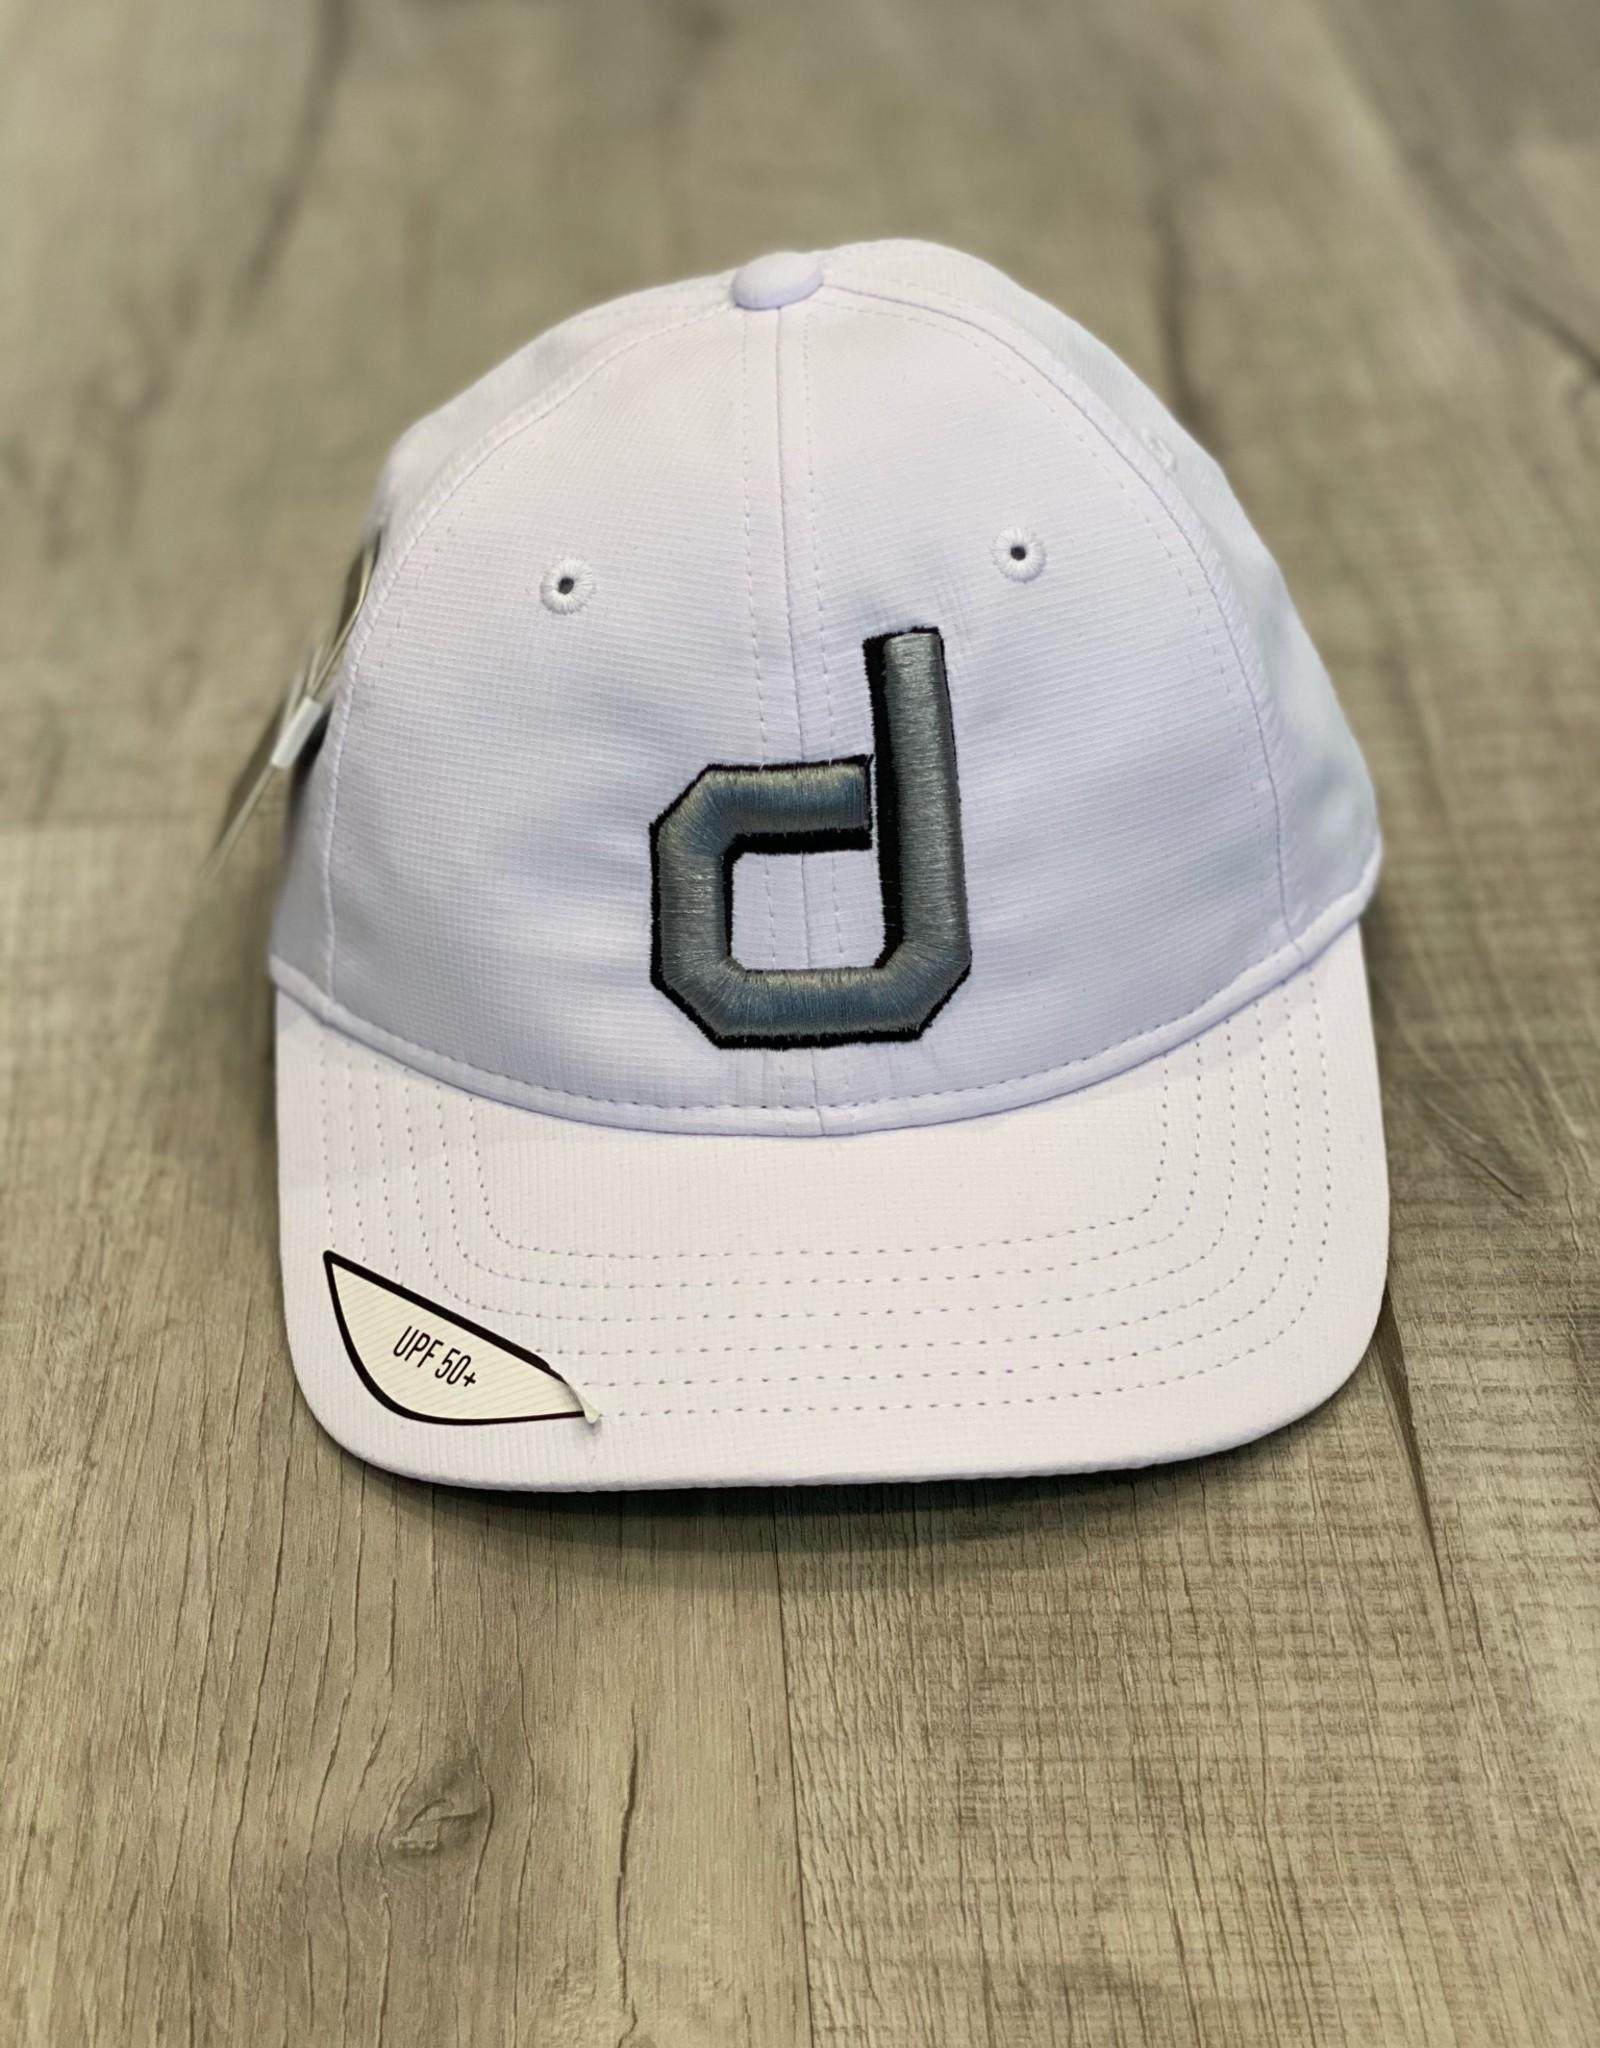 TaylorMade Adjustable Hat